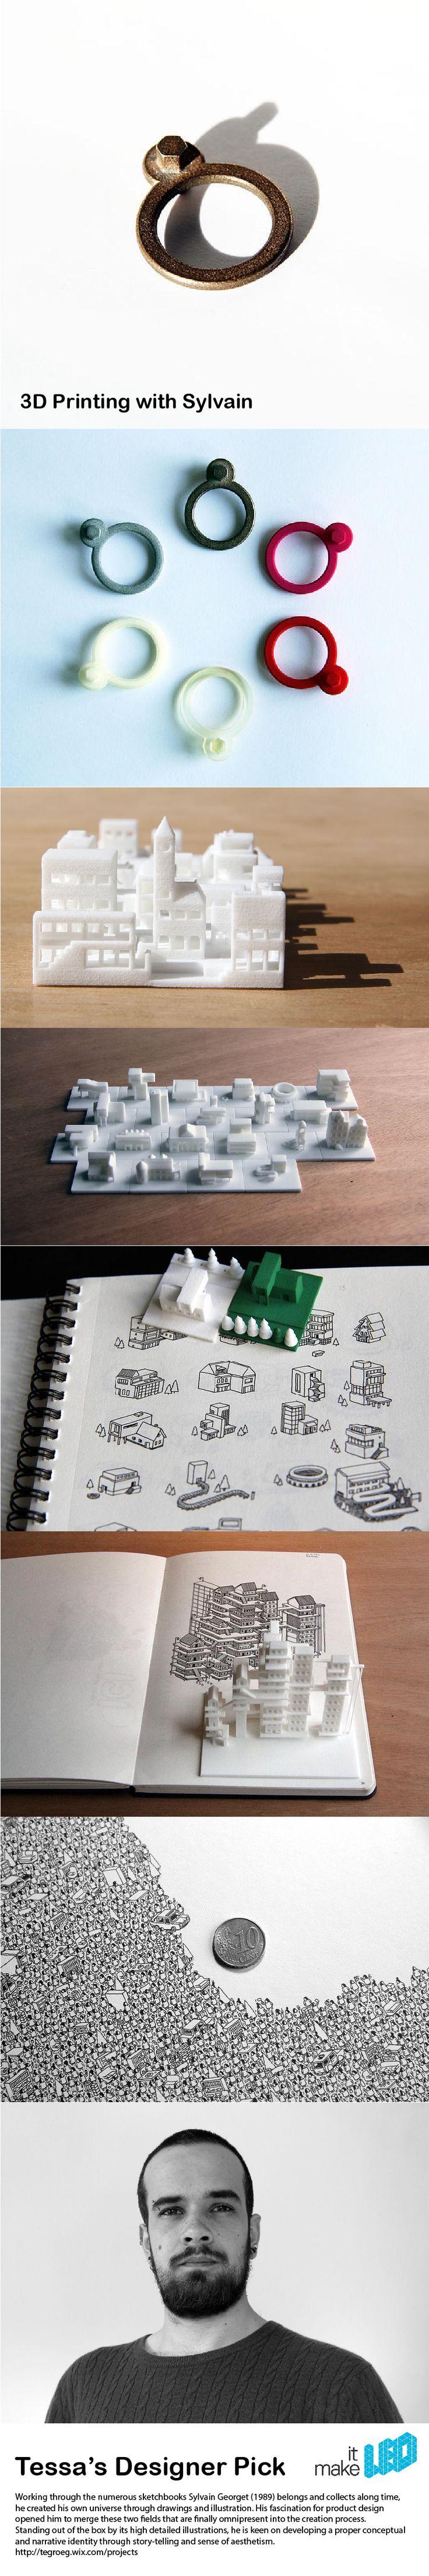 Tessa's Designer Picks - 3D printed designs by Sylvain Tegroeg